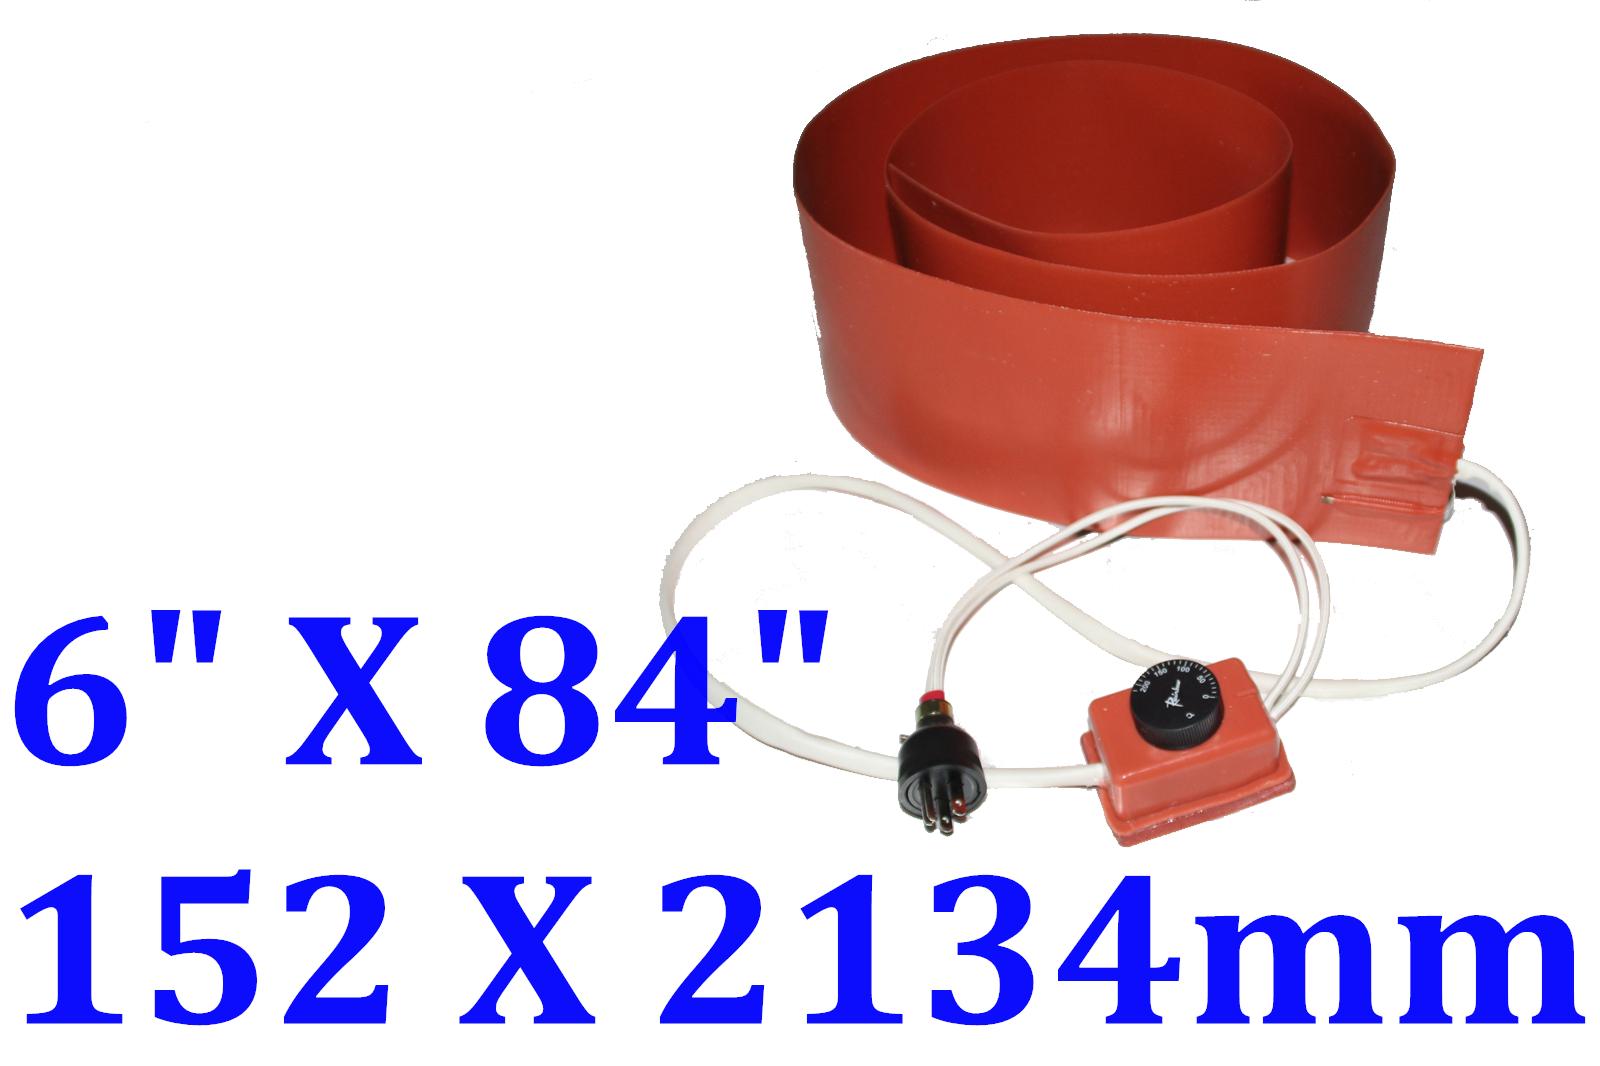 "6"" X 84"" 152 X 2134mm 120V 2400W  w/ Control Plug Guitar Bending Heating Blanket"